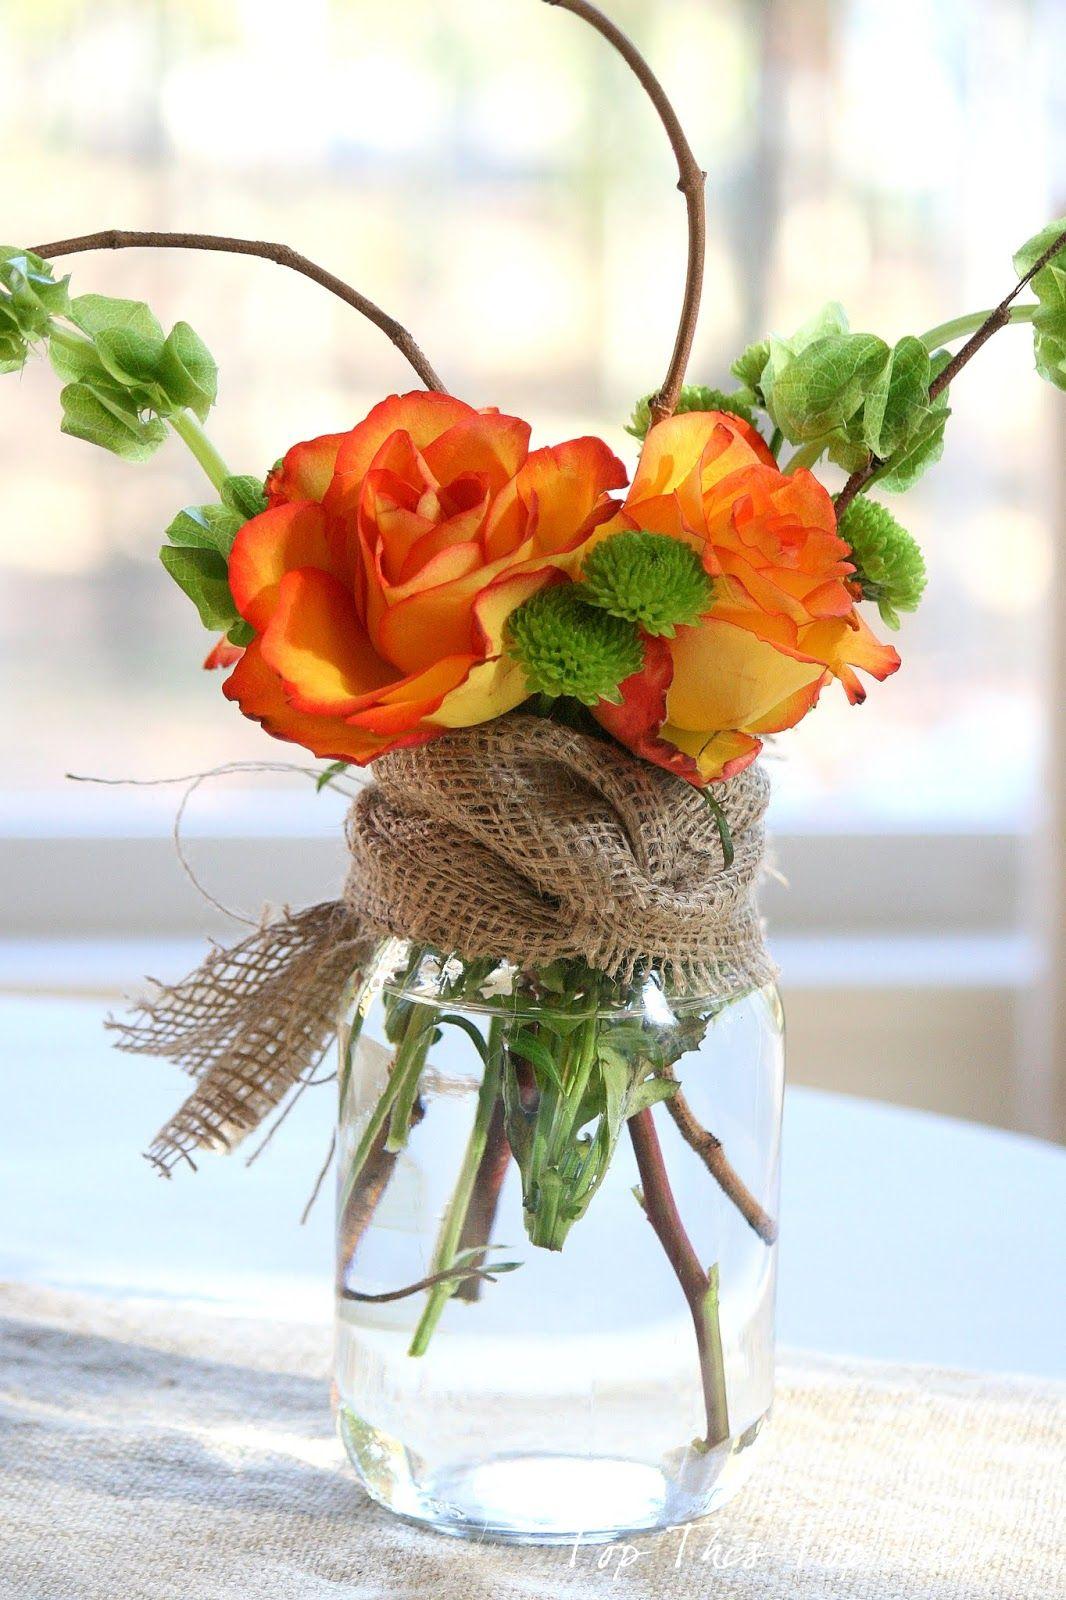 Flower Arrangements Centerpieces : Fall floral arrangements on pinterest flower